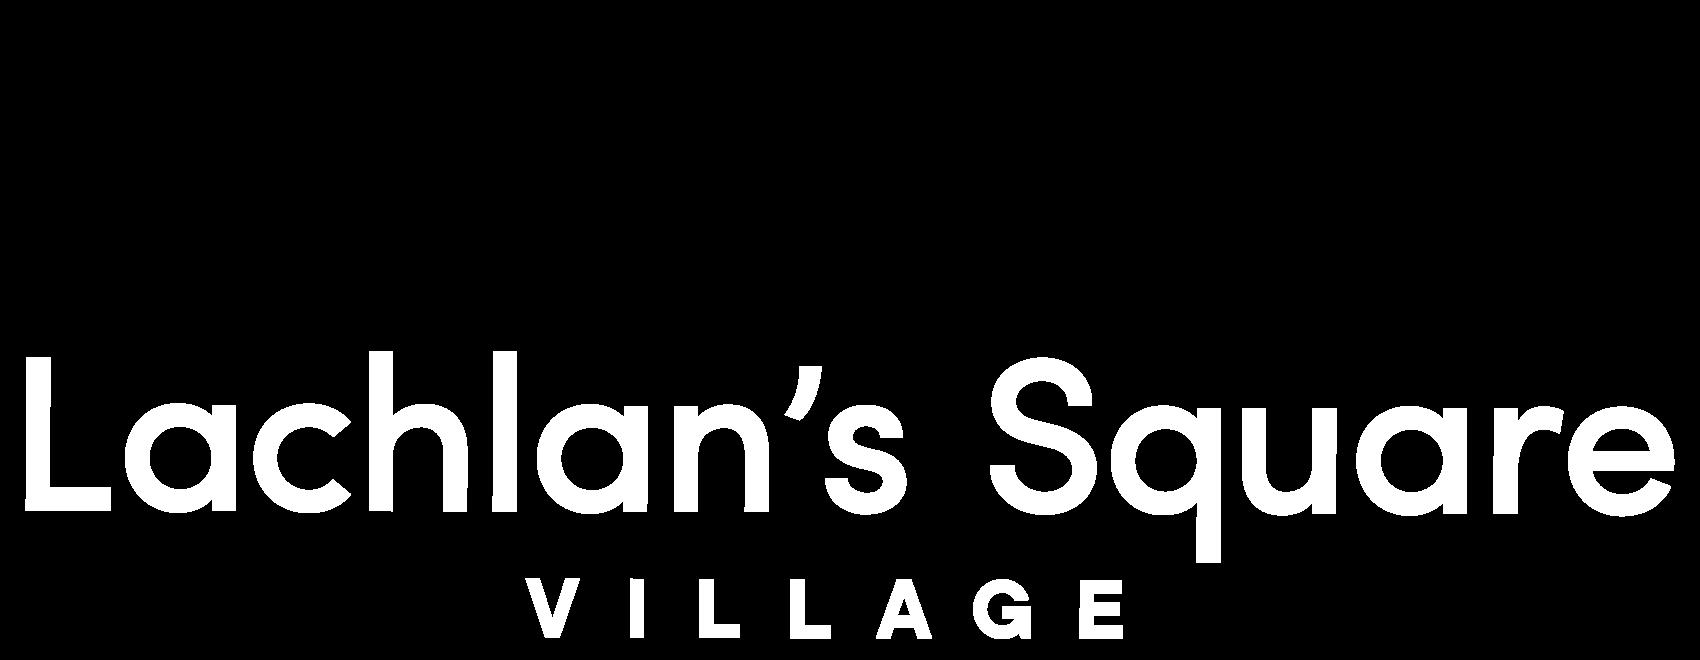 design-and-marketing-lachlans-square-village-logo3